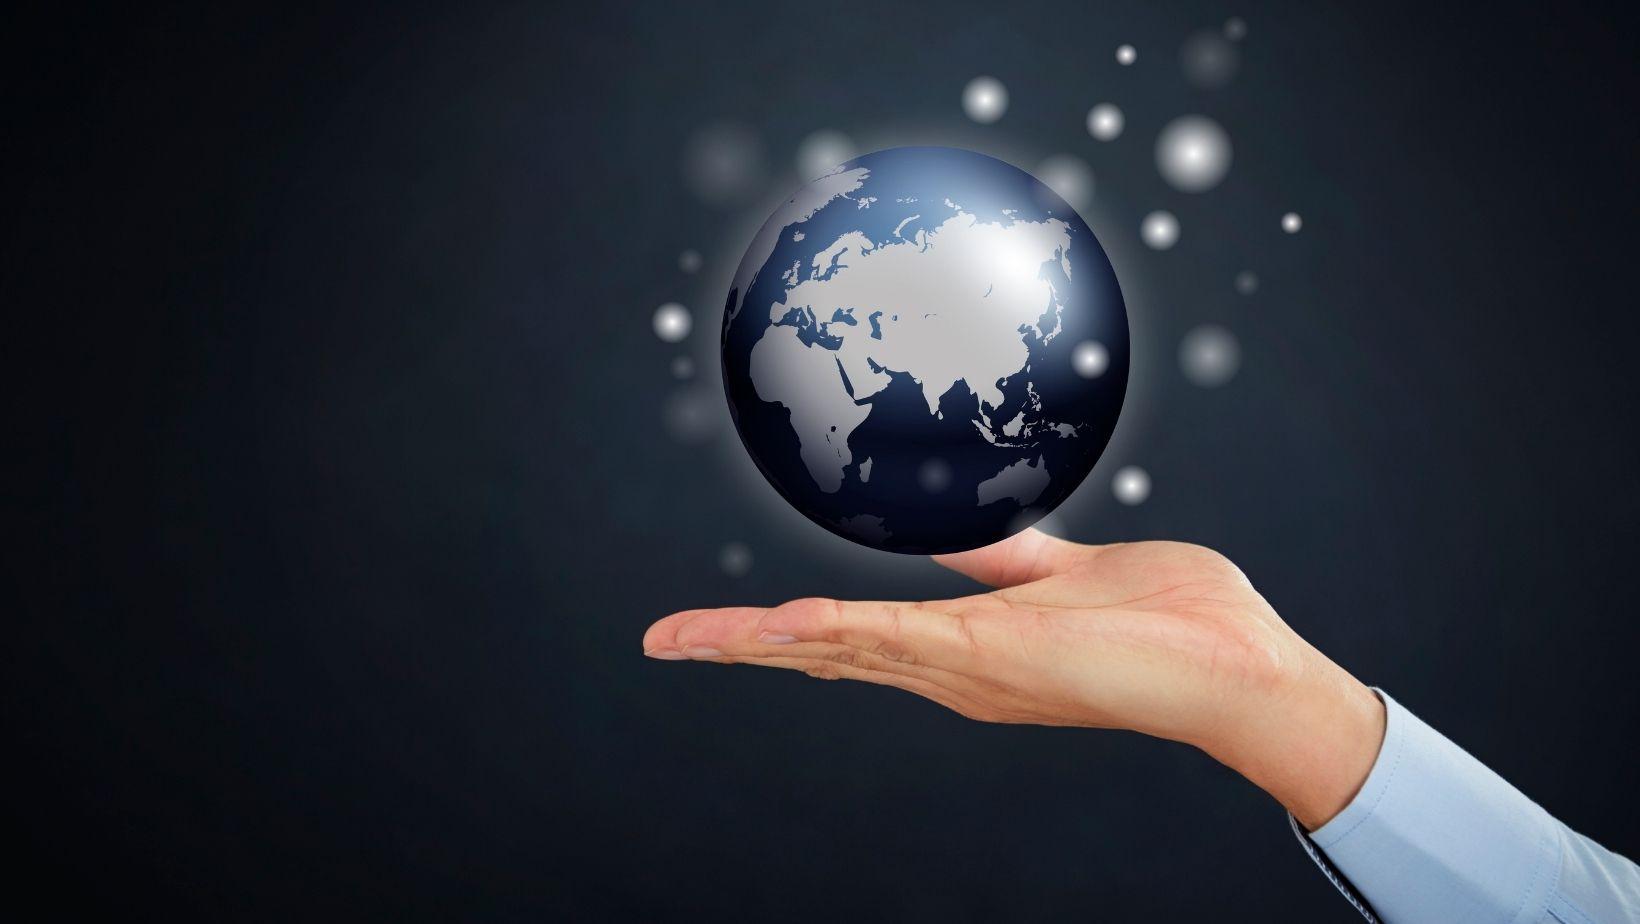 When Can Data Sharing Shape a Better Future?